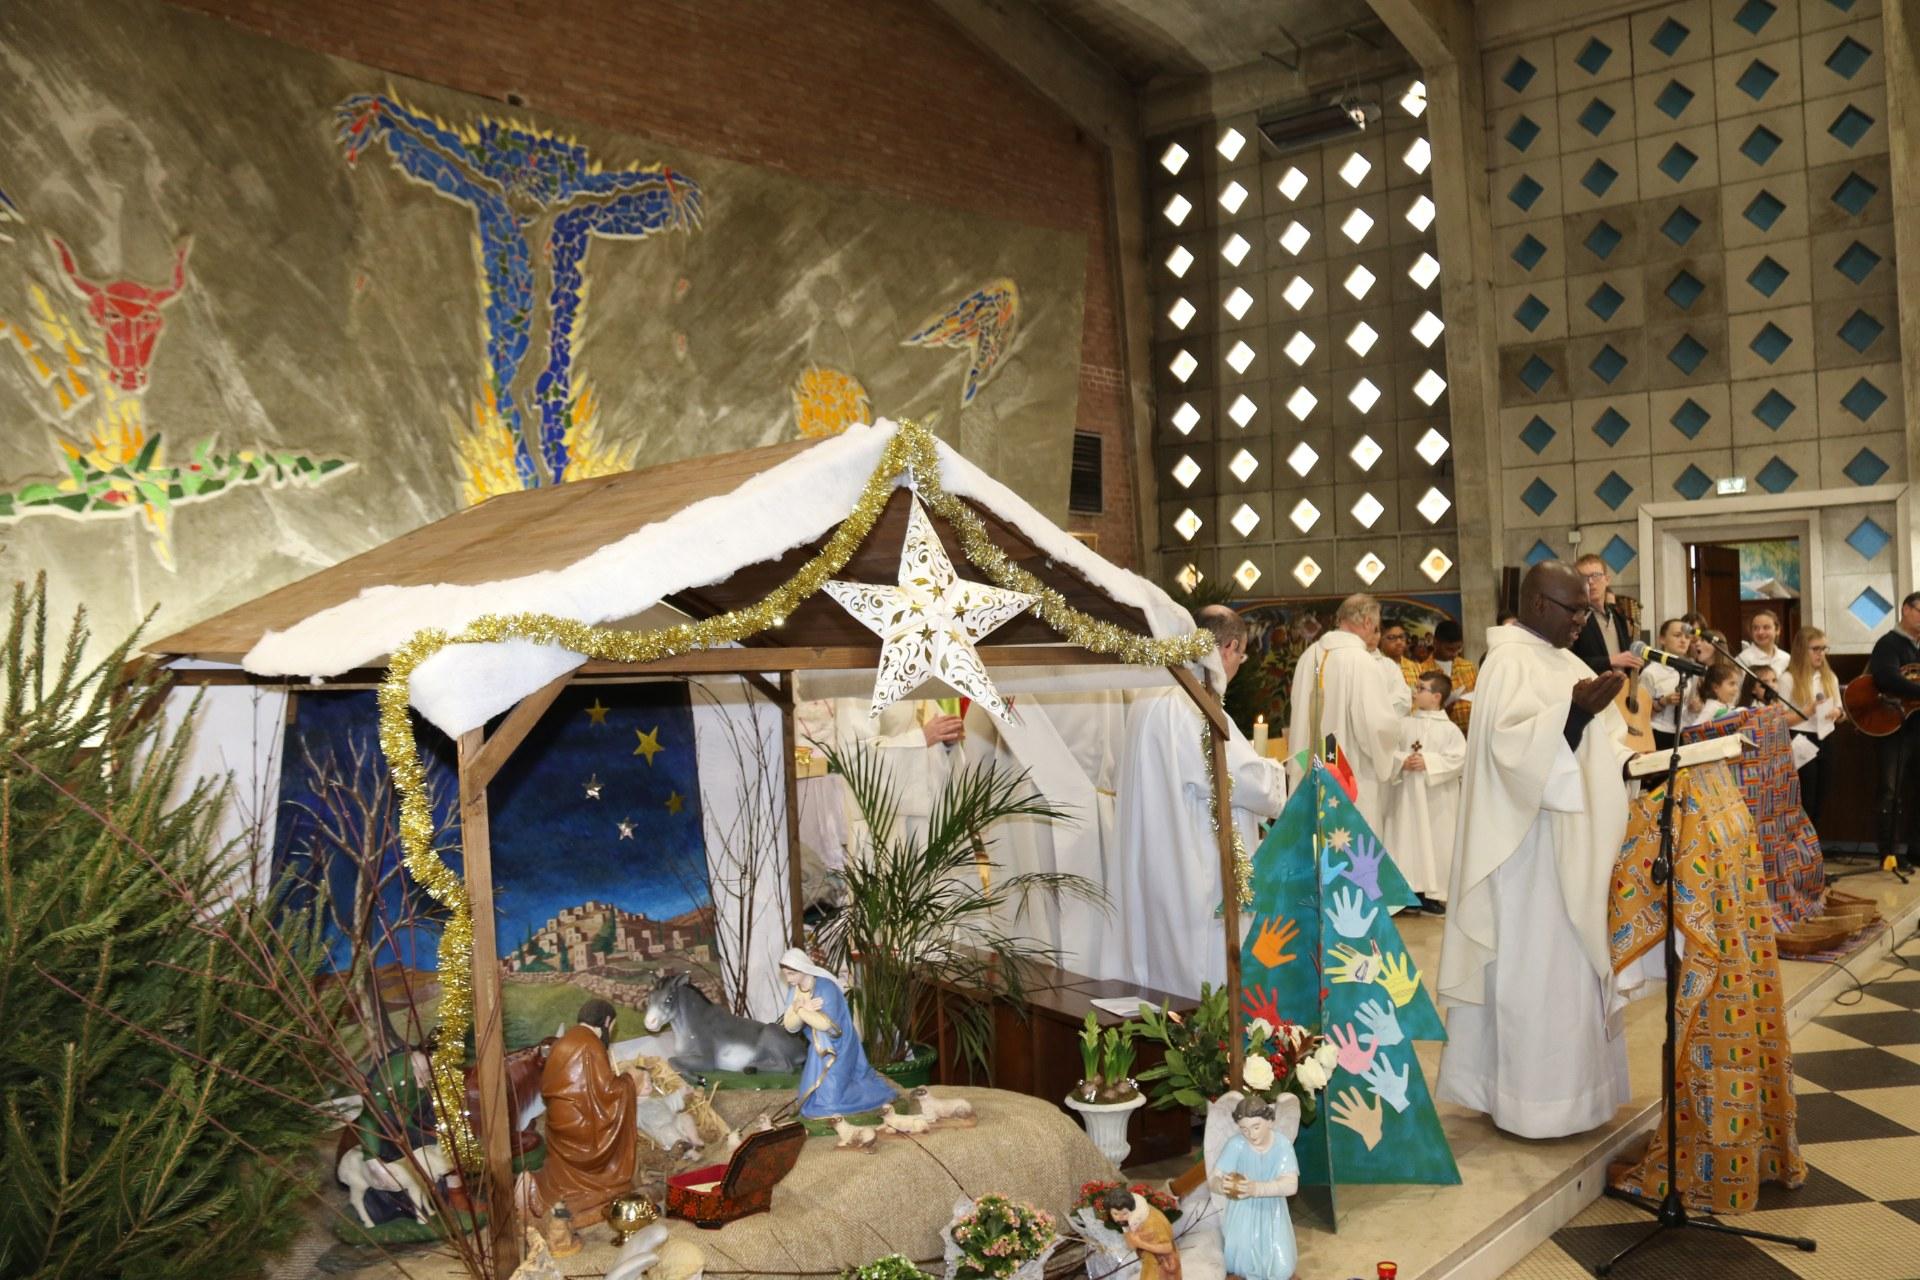 Messe des Nations 94